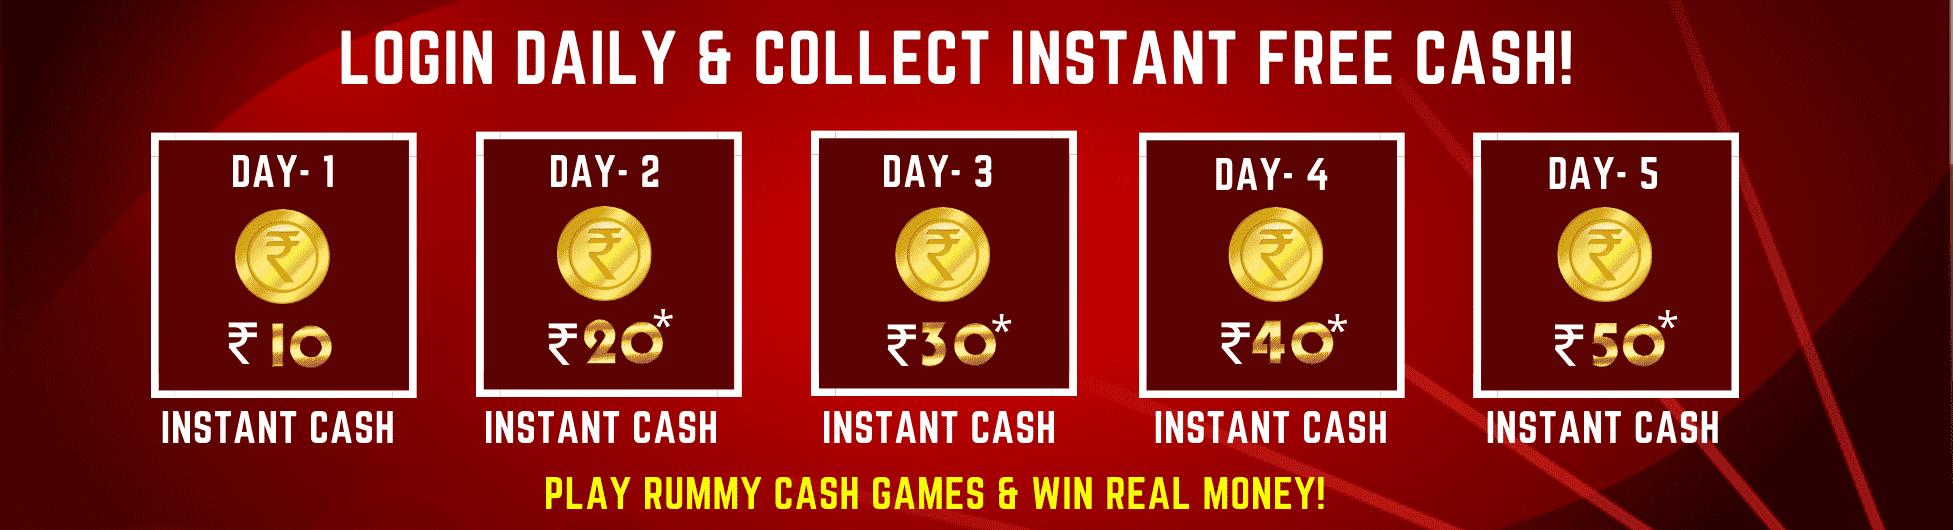 Rummy Instant Cash Bonus on Daily Login upto Rs.50 at Silkrummy